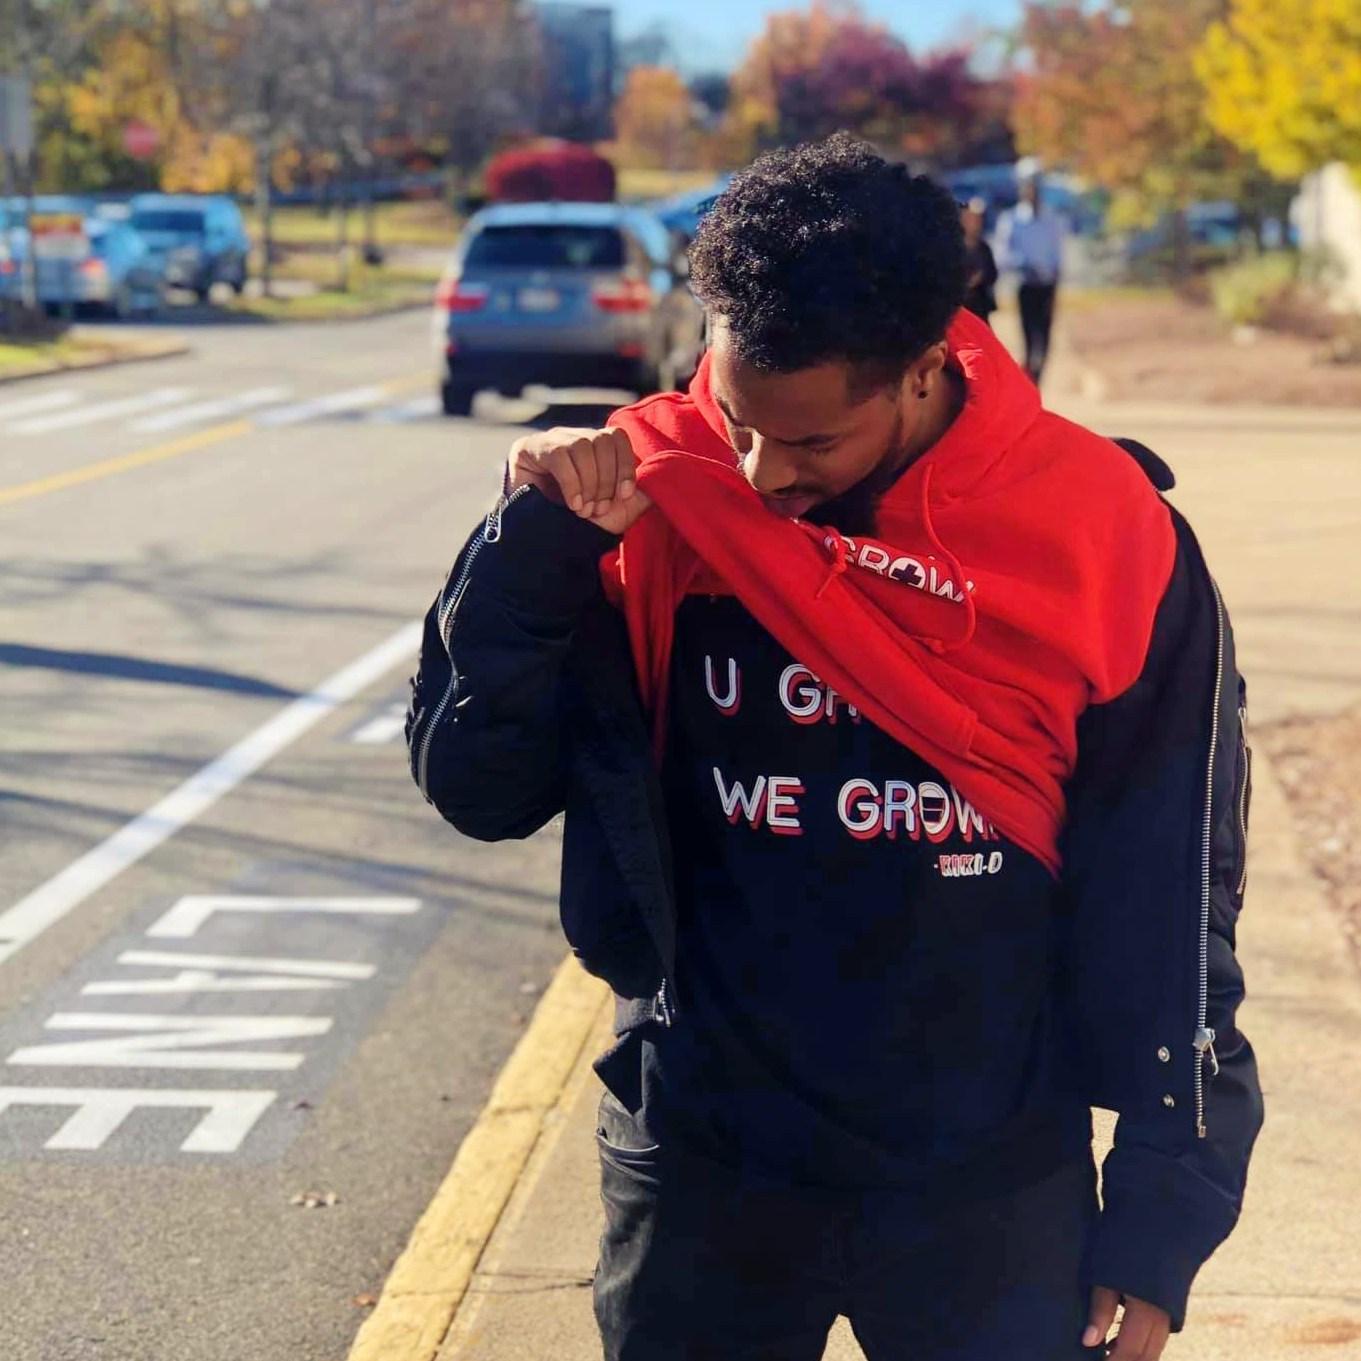 Hip hop artist, M.Y.T.H. supporting Kiki.D's Merch